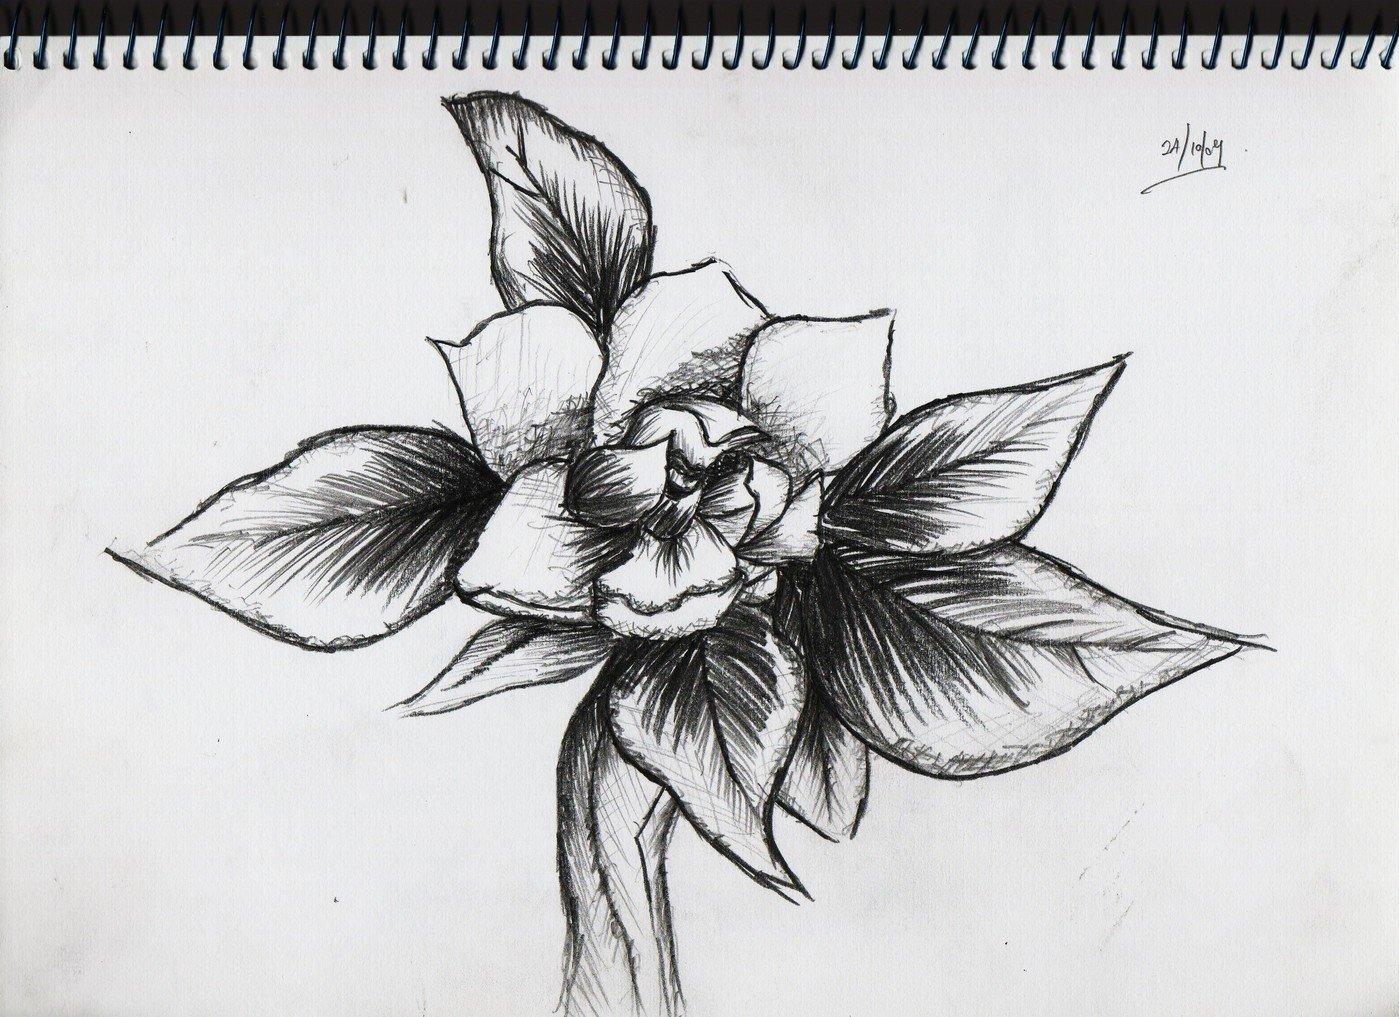 Pencil work by yingling tan at coroflot com